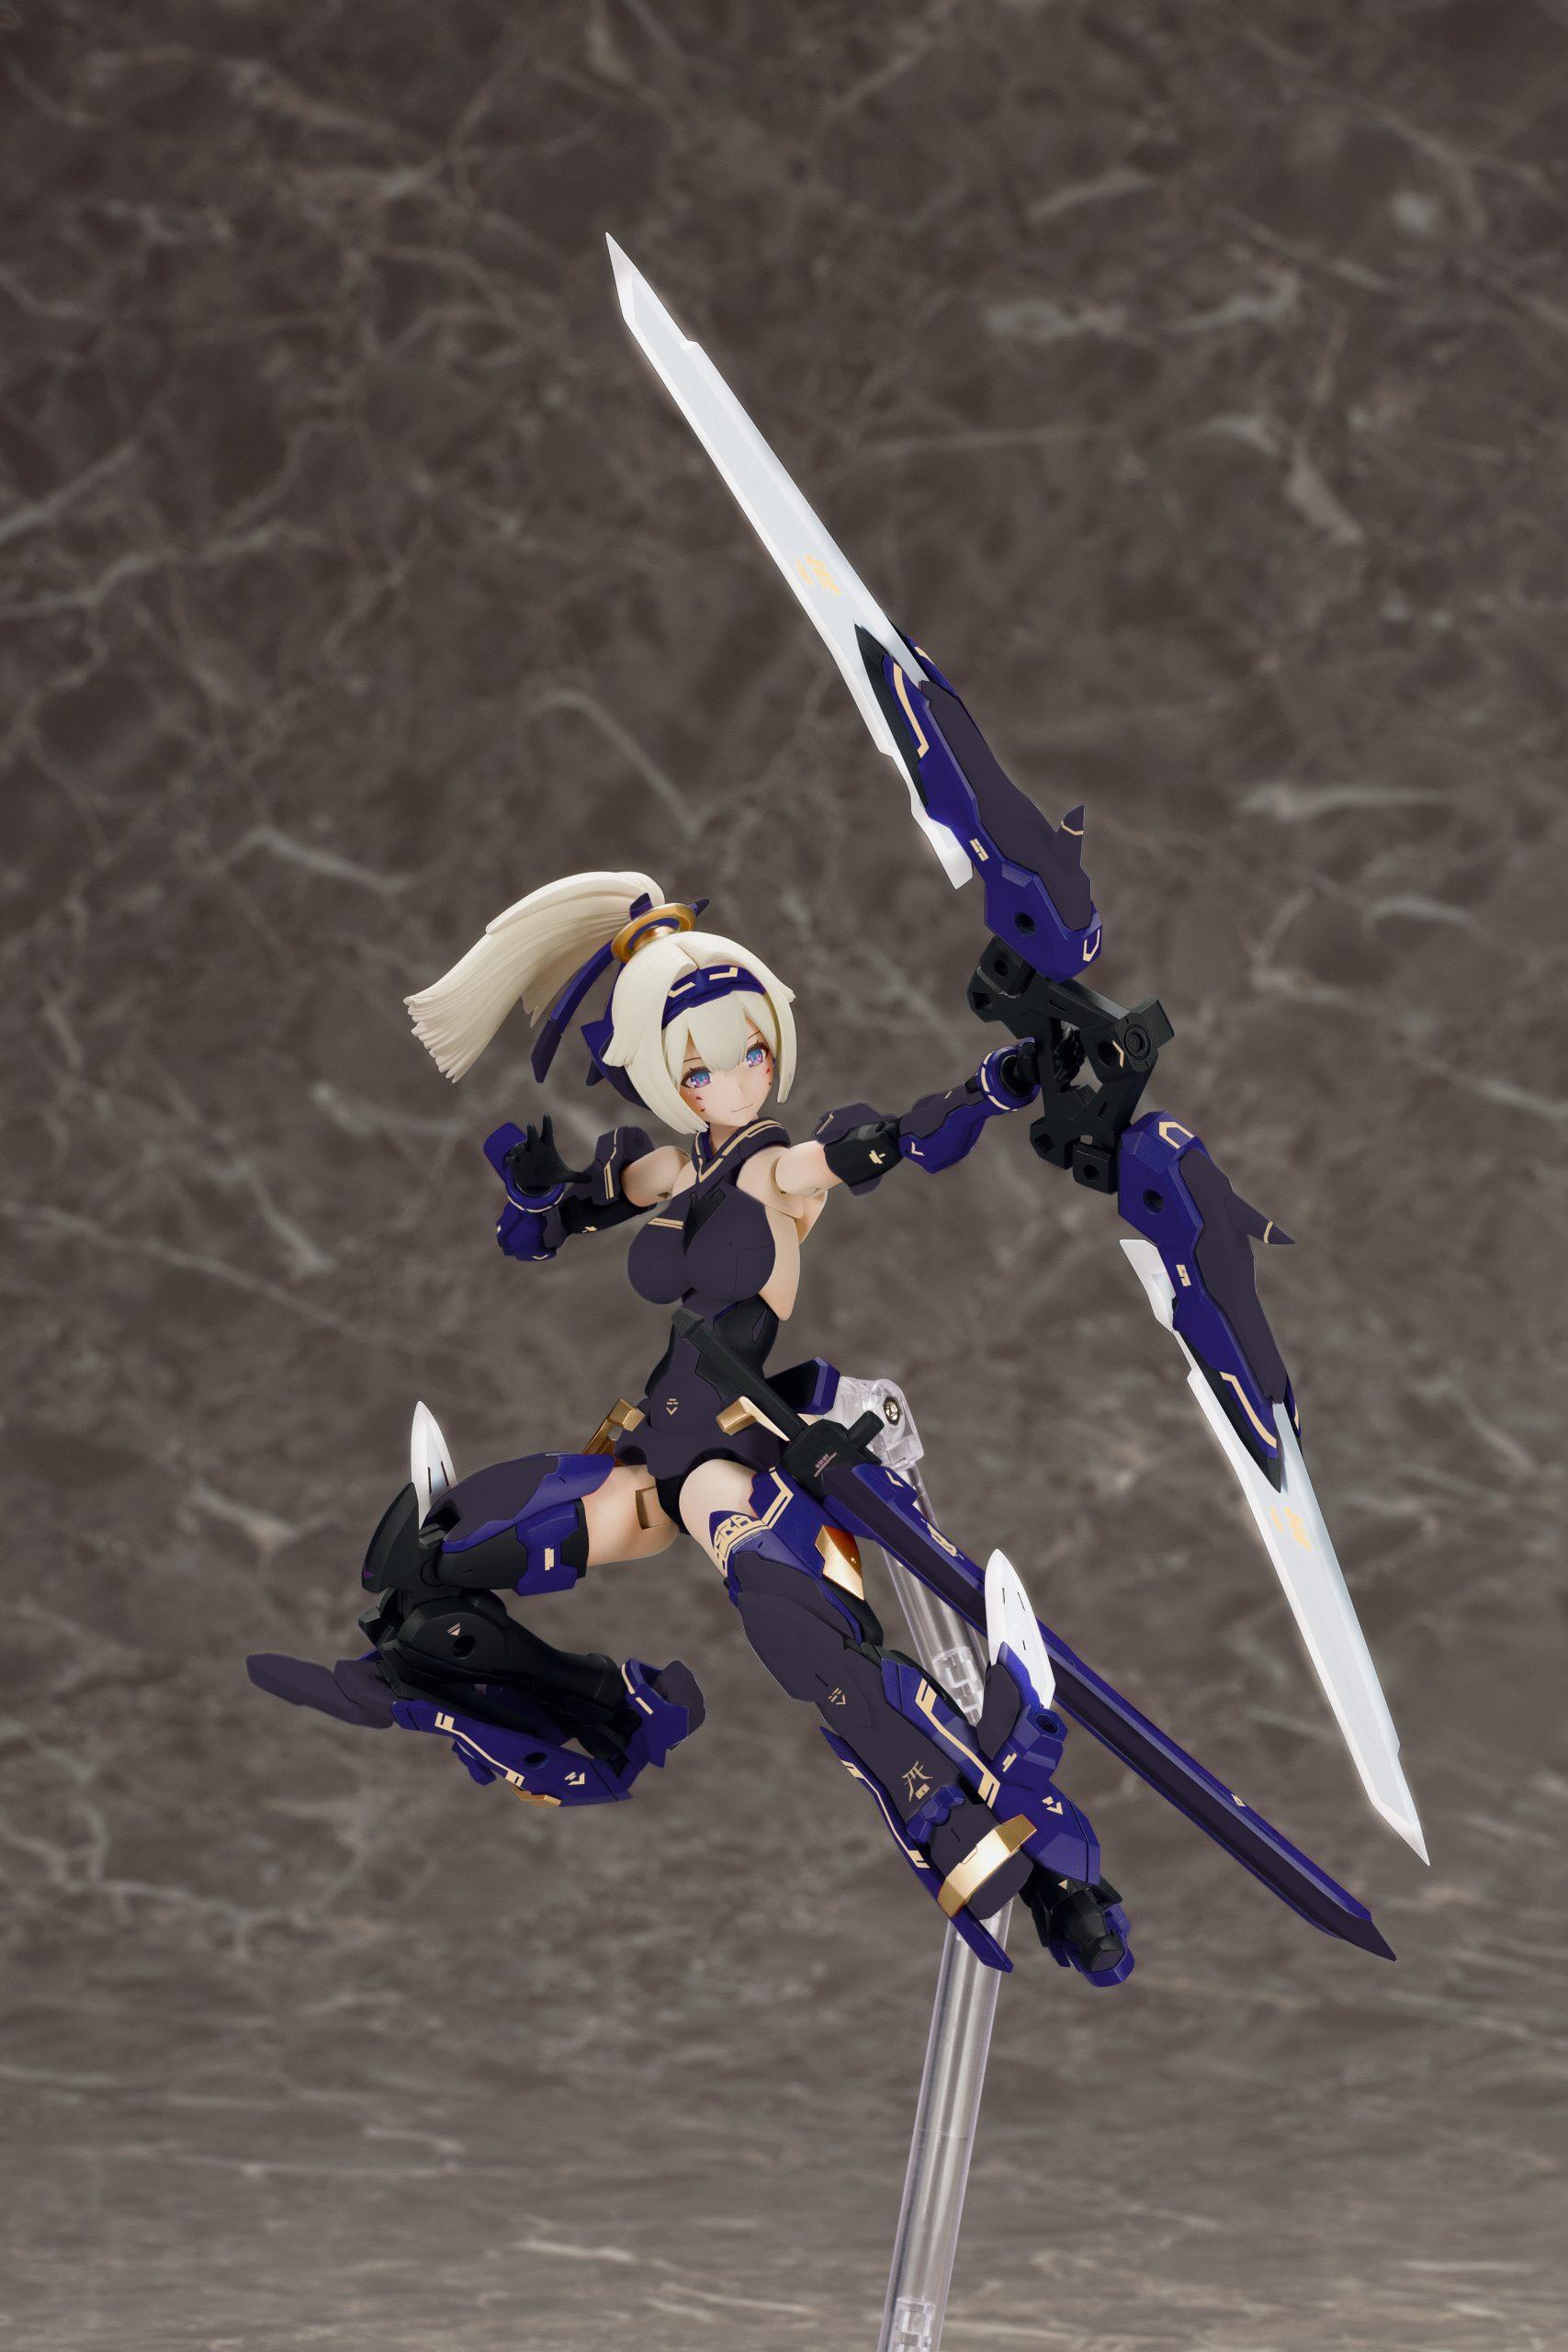 Kotobukiya 1/1 Asra Archer Shadow Edition, Action Figure Kit